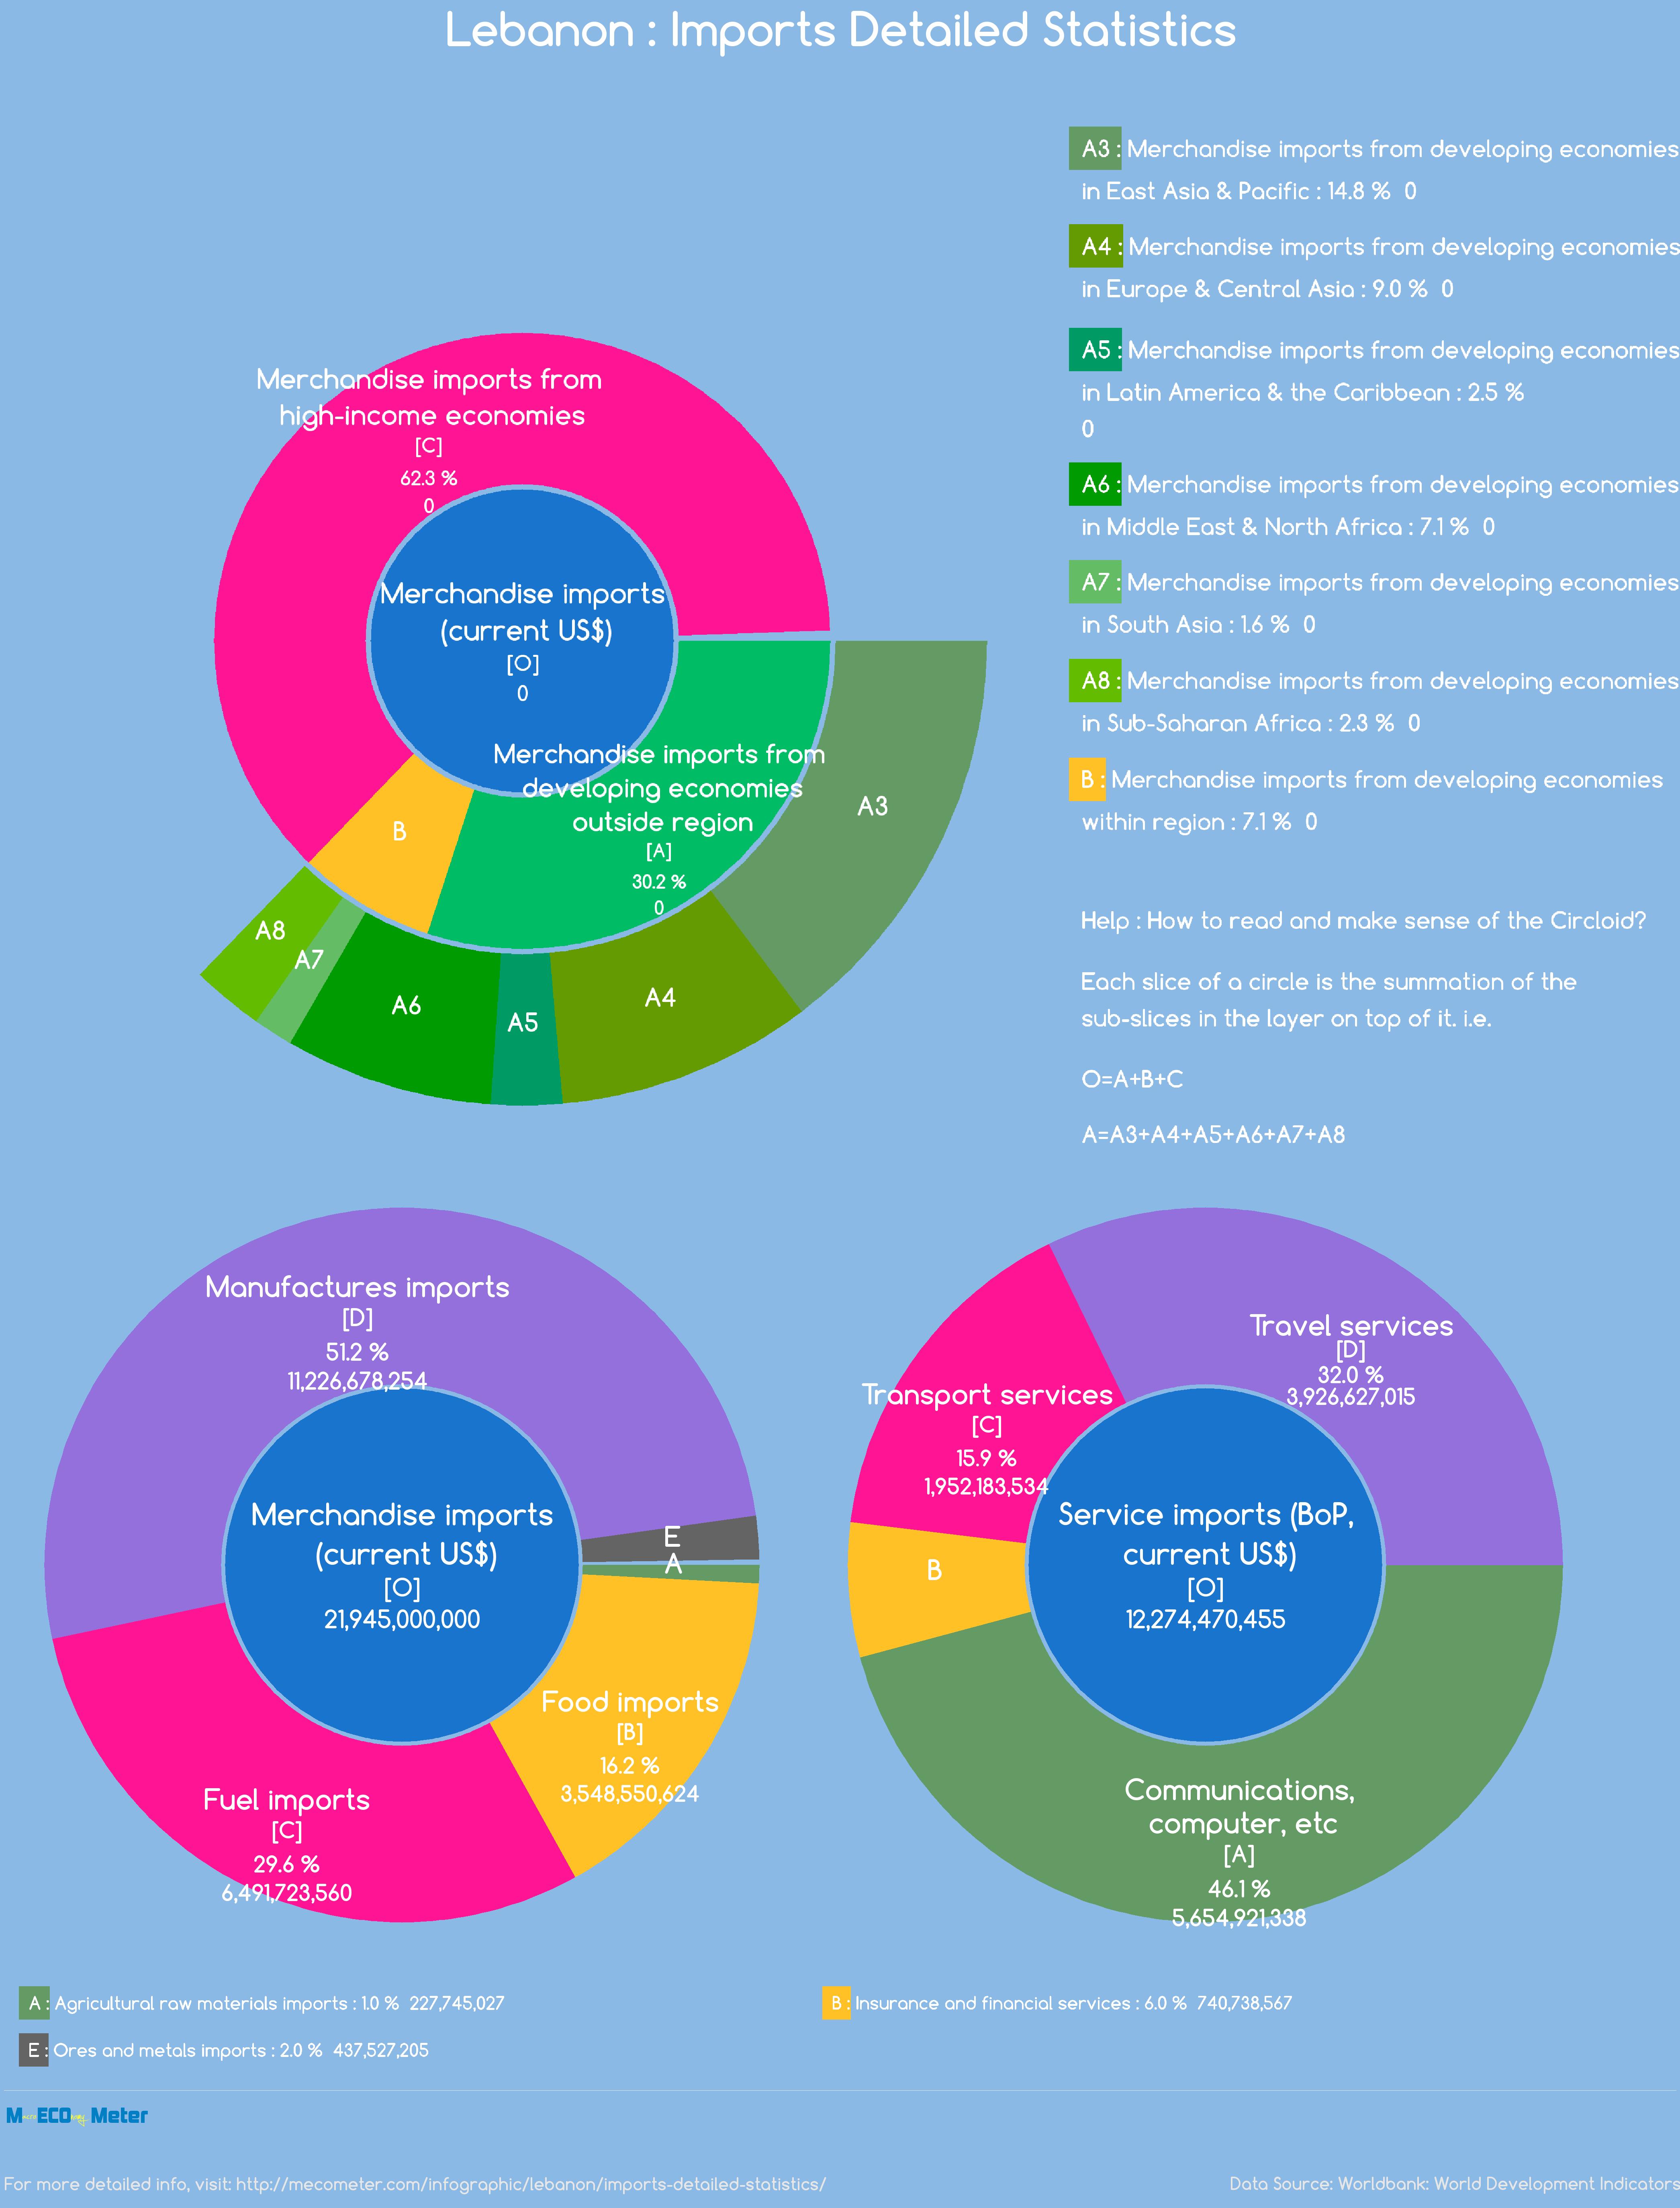 Lebanon : Imports Detailed Statistics